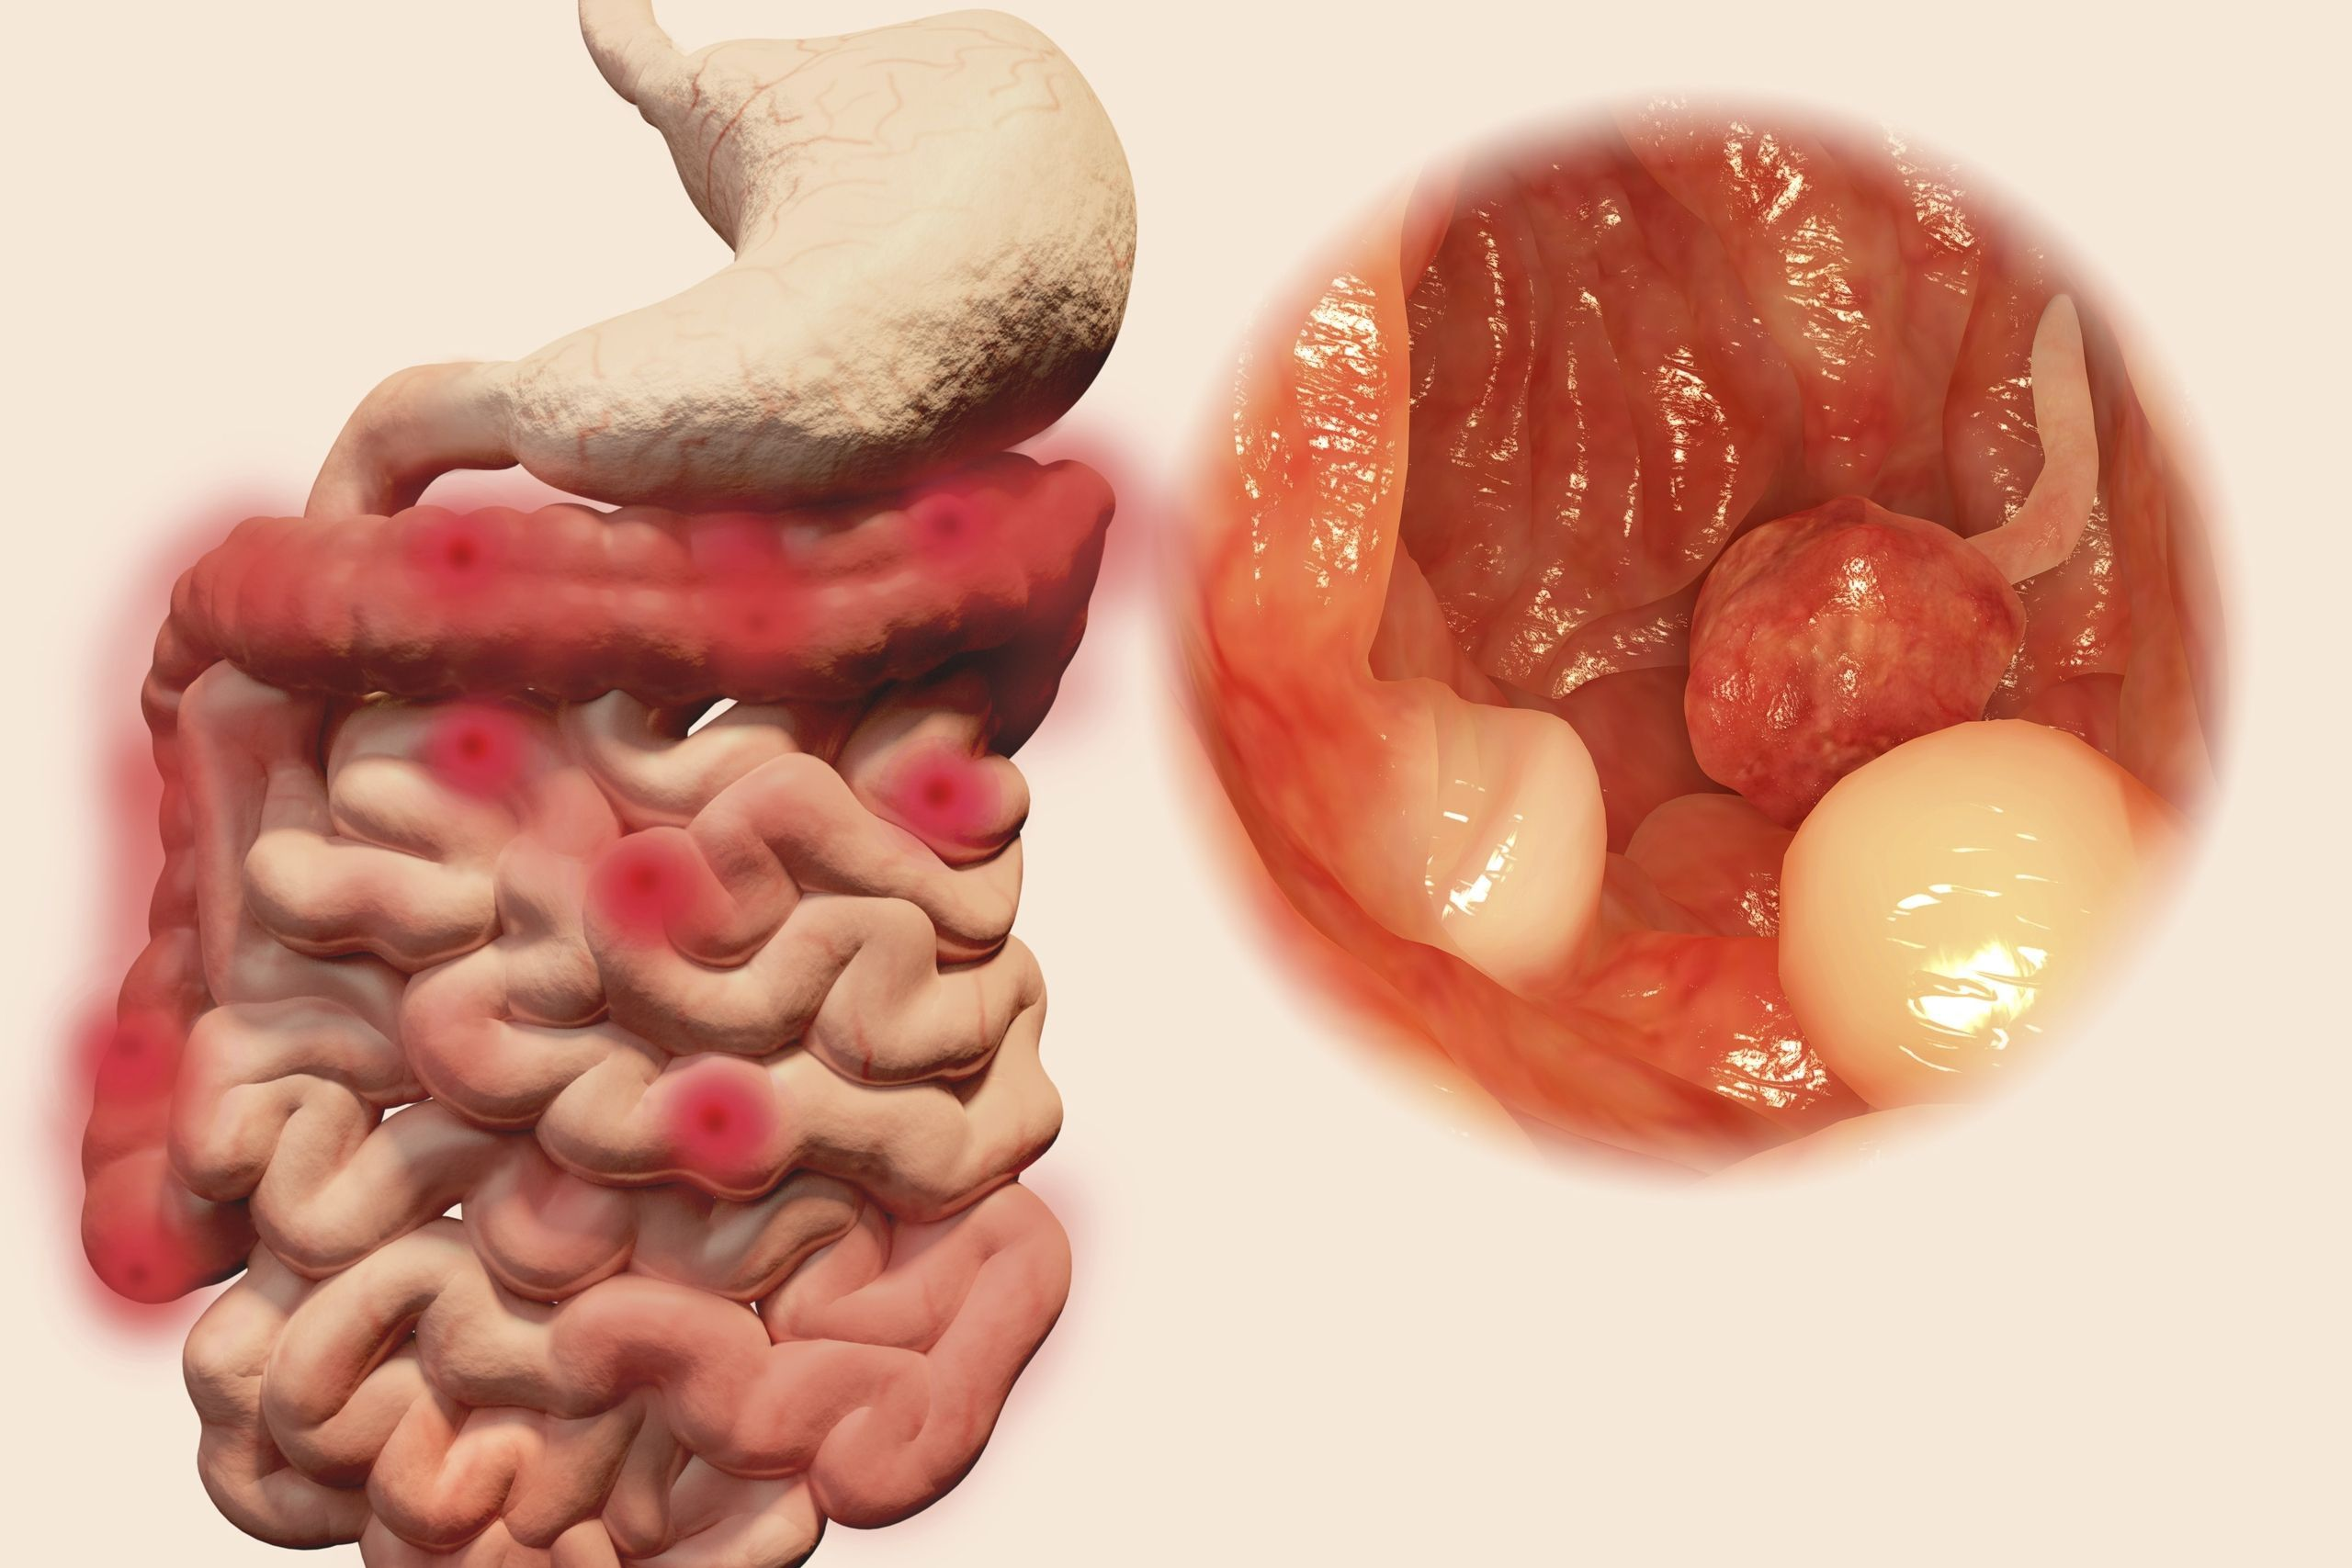 cancer colon homme symptome duct papilloma symptoms